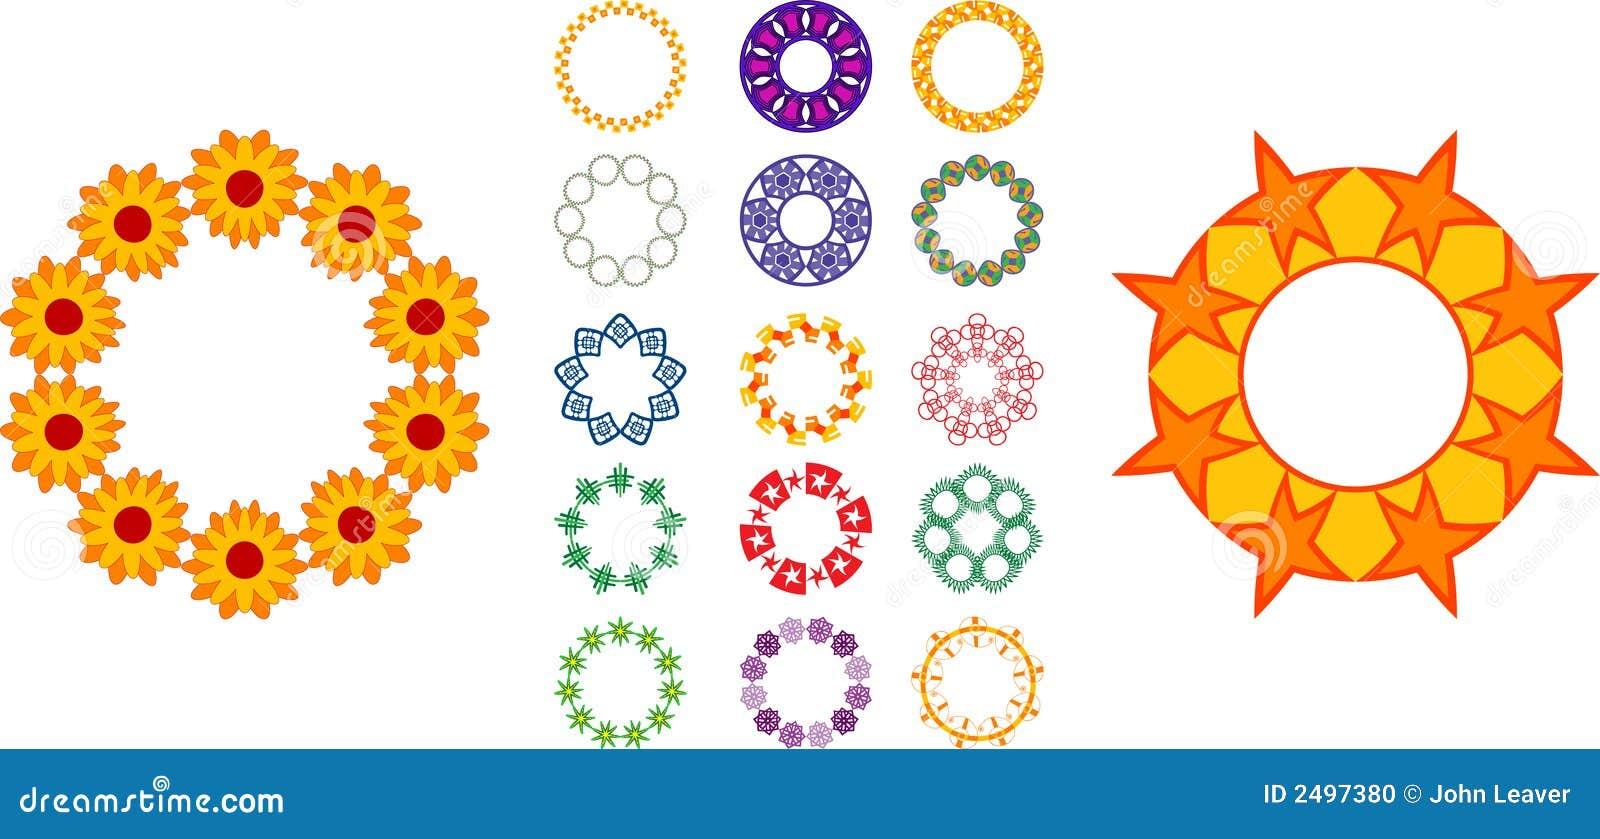 Circular Designs Stock Vector Image Of Patterns Circles